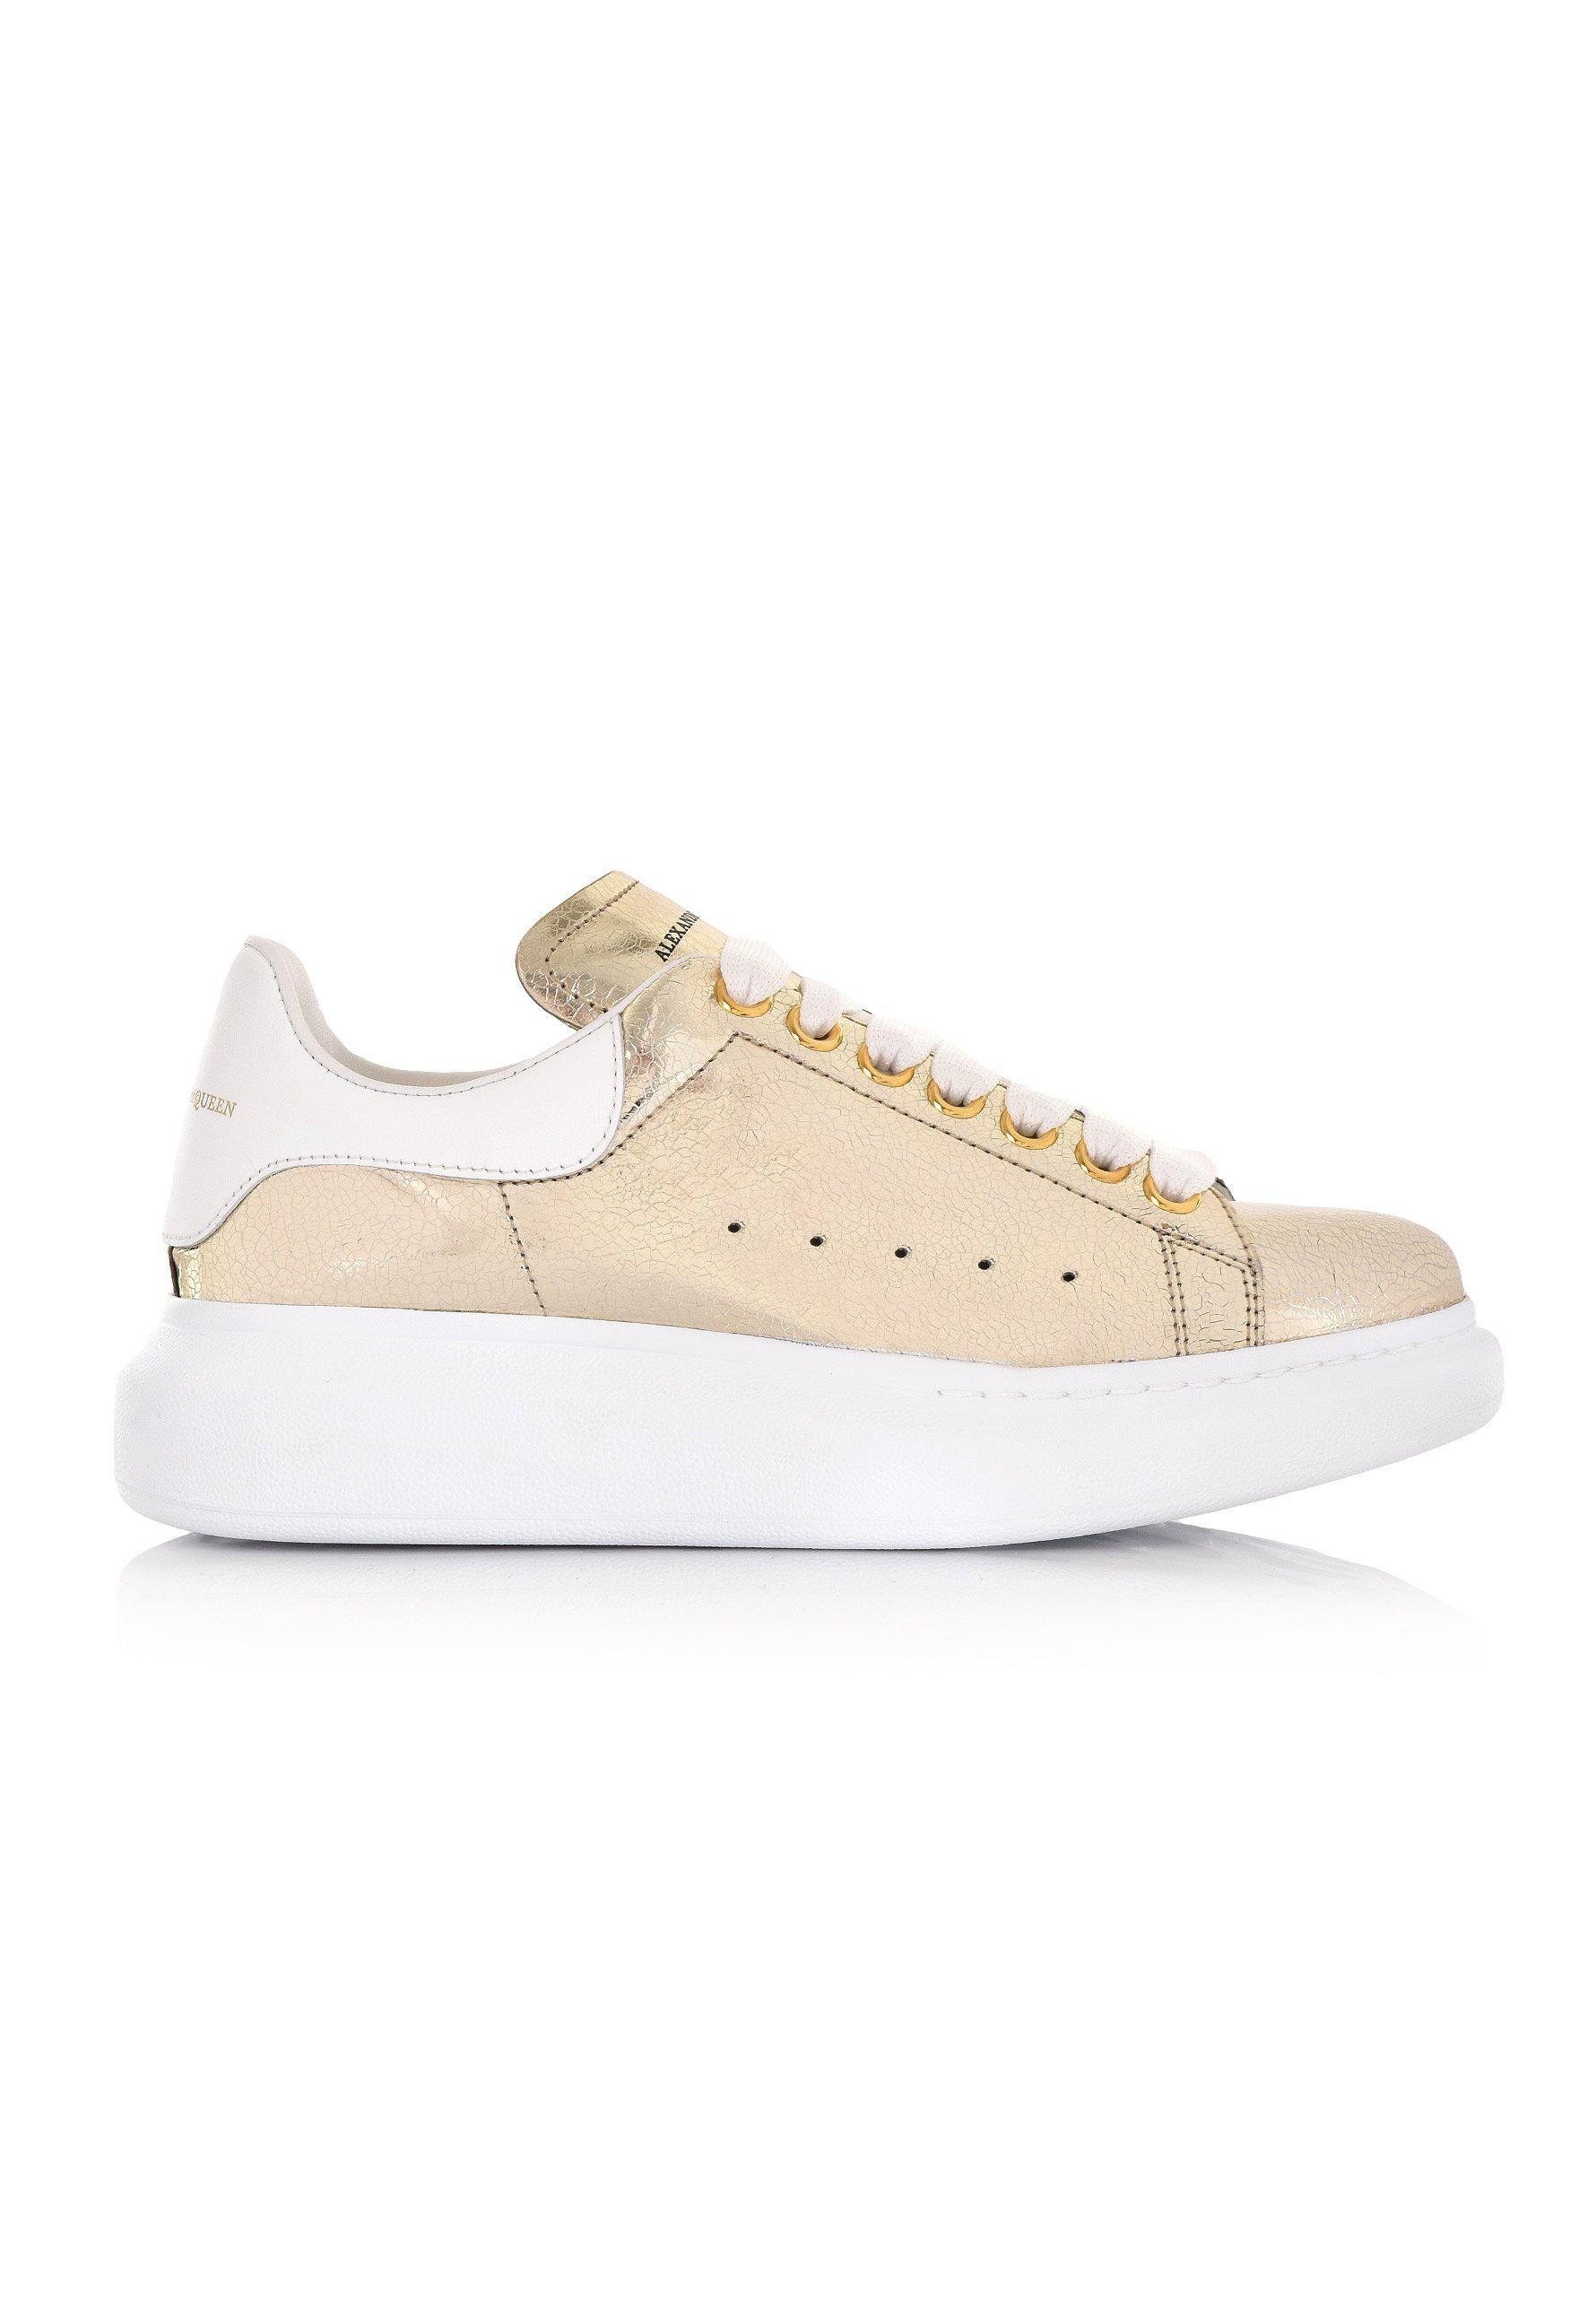 6545d2fa468e Lyst - Alexander McQueen Women s Metallic Oversized Sneaker Gold white